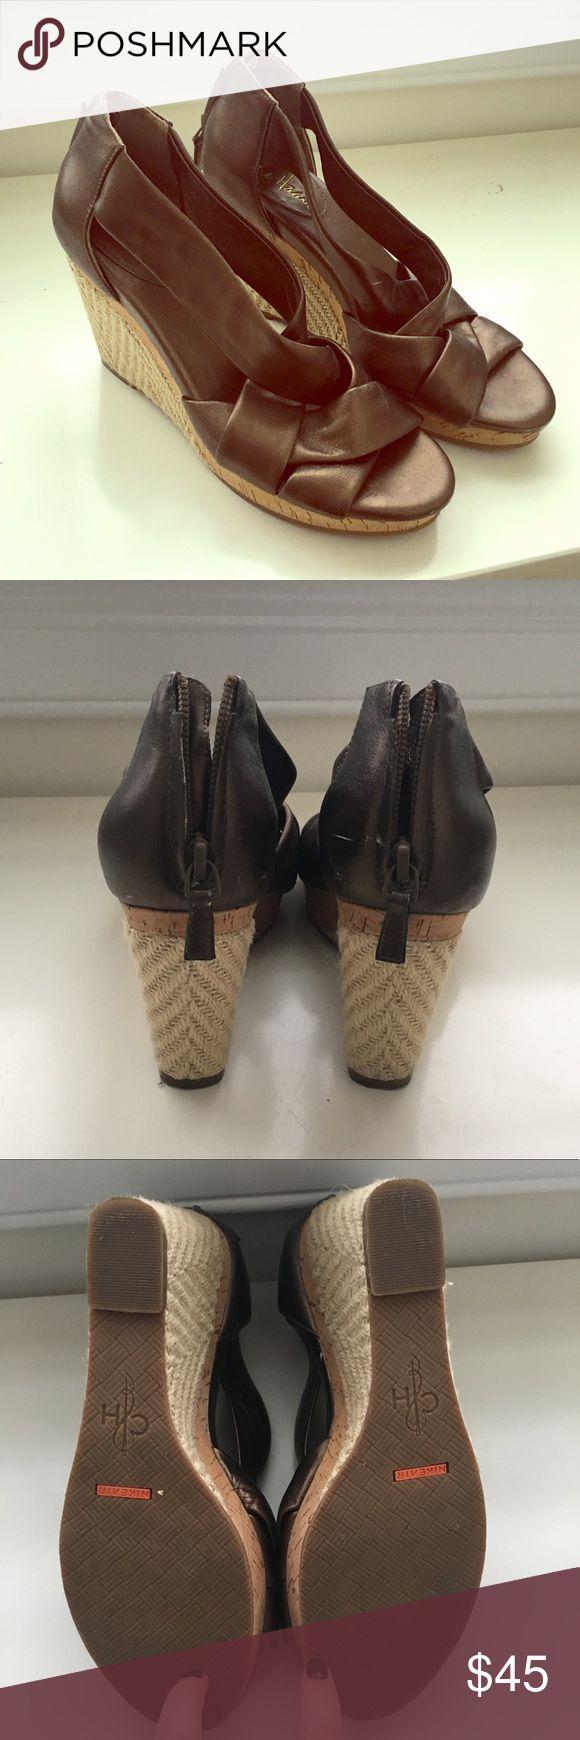 Cole Haan wedges Cole Haan wedges. Bronze/metallic with zip closure. Worn a handful of times. Very comfortable! Cole Haan Shoes Wedges